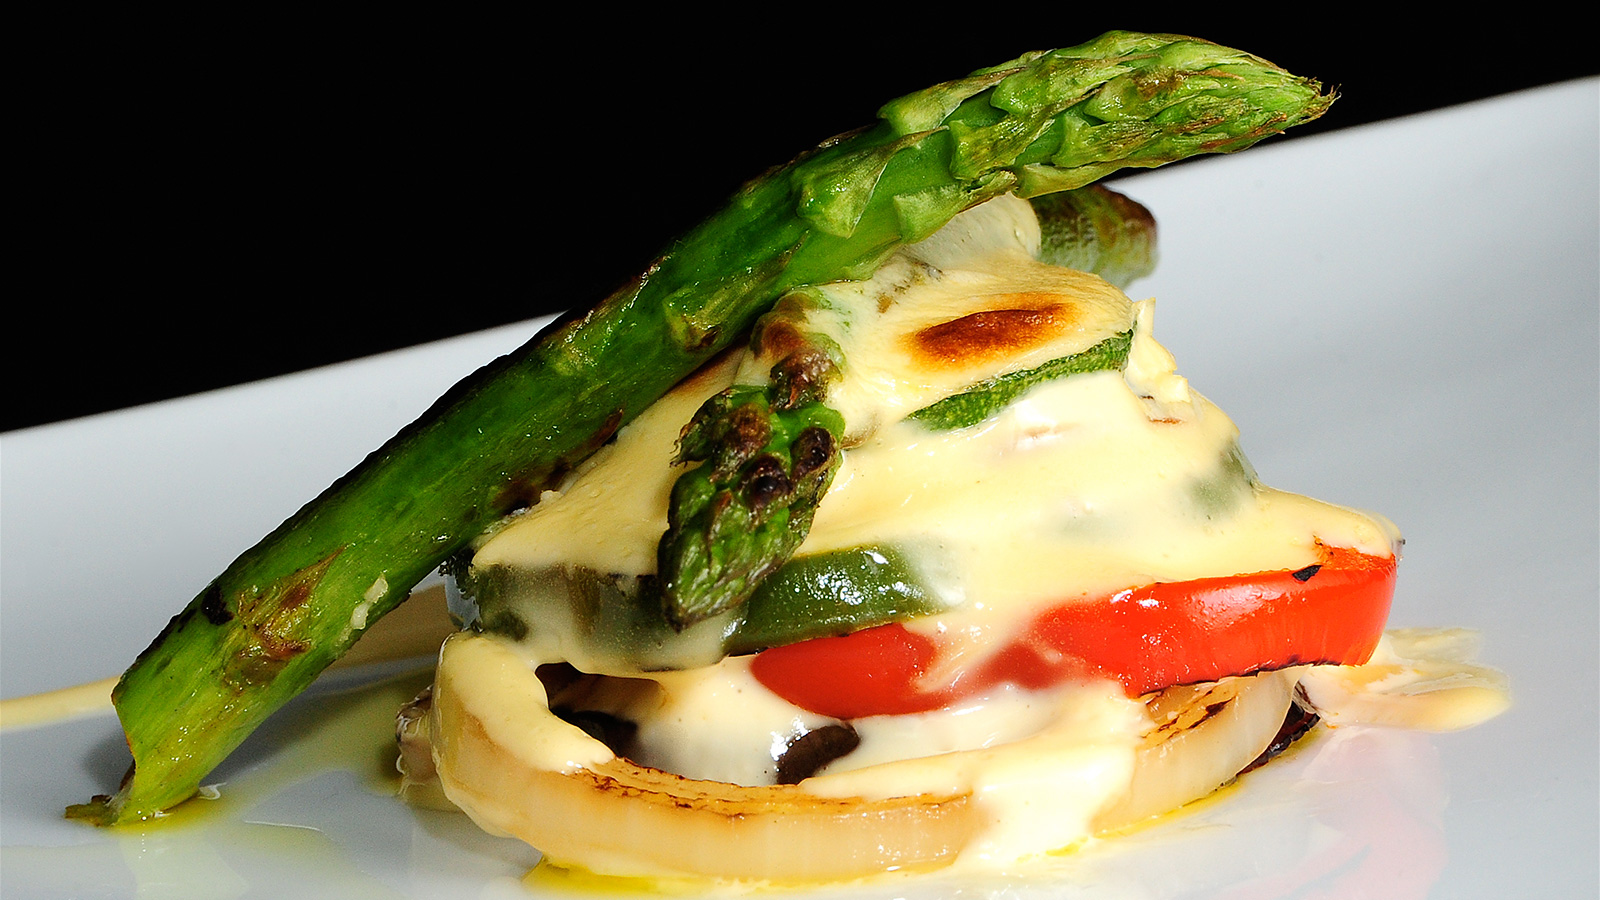 Milhojas de verduras al ajo tostado chema de isidro for Chema de isidro canal cocina